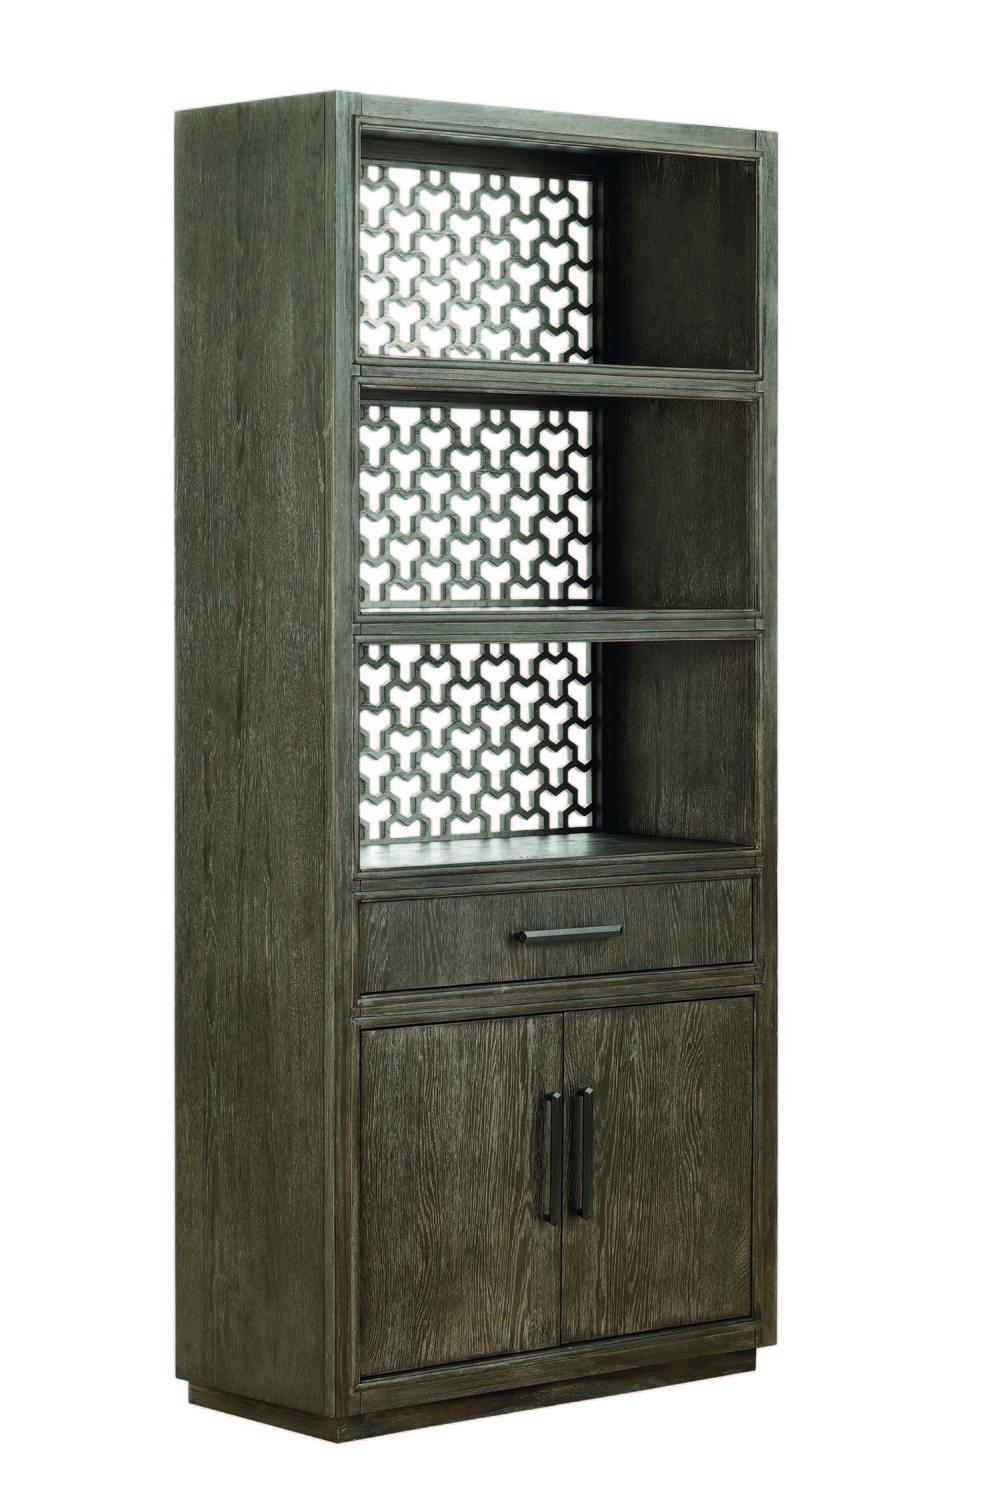 A.R.T. Furniture - Tourmaline Door Bookcase